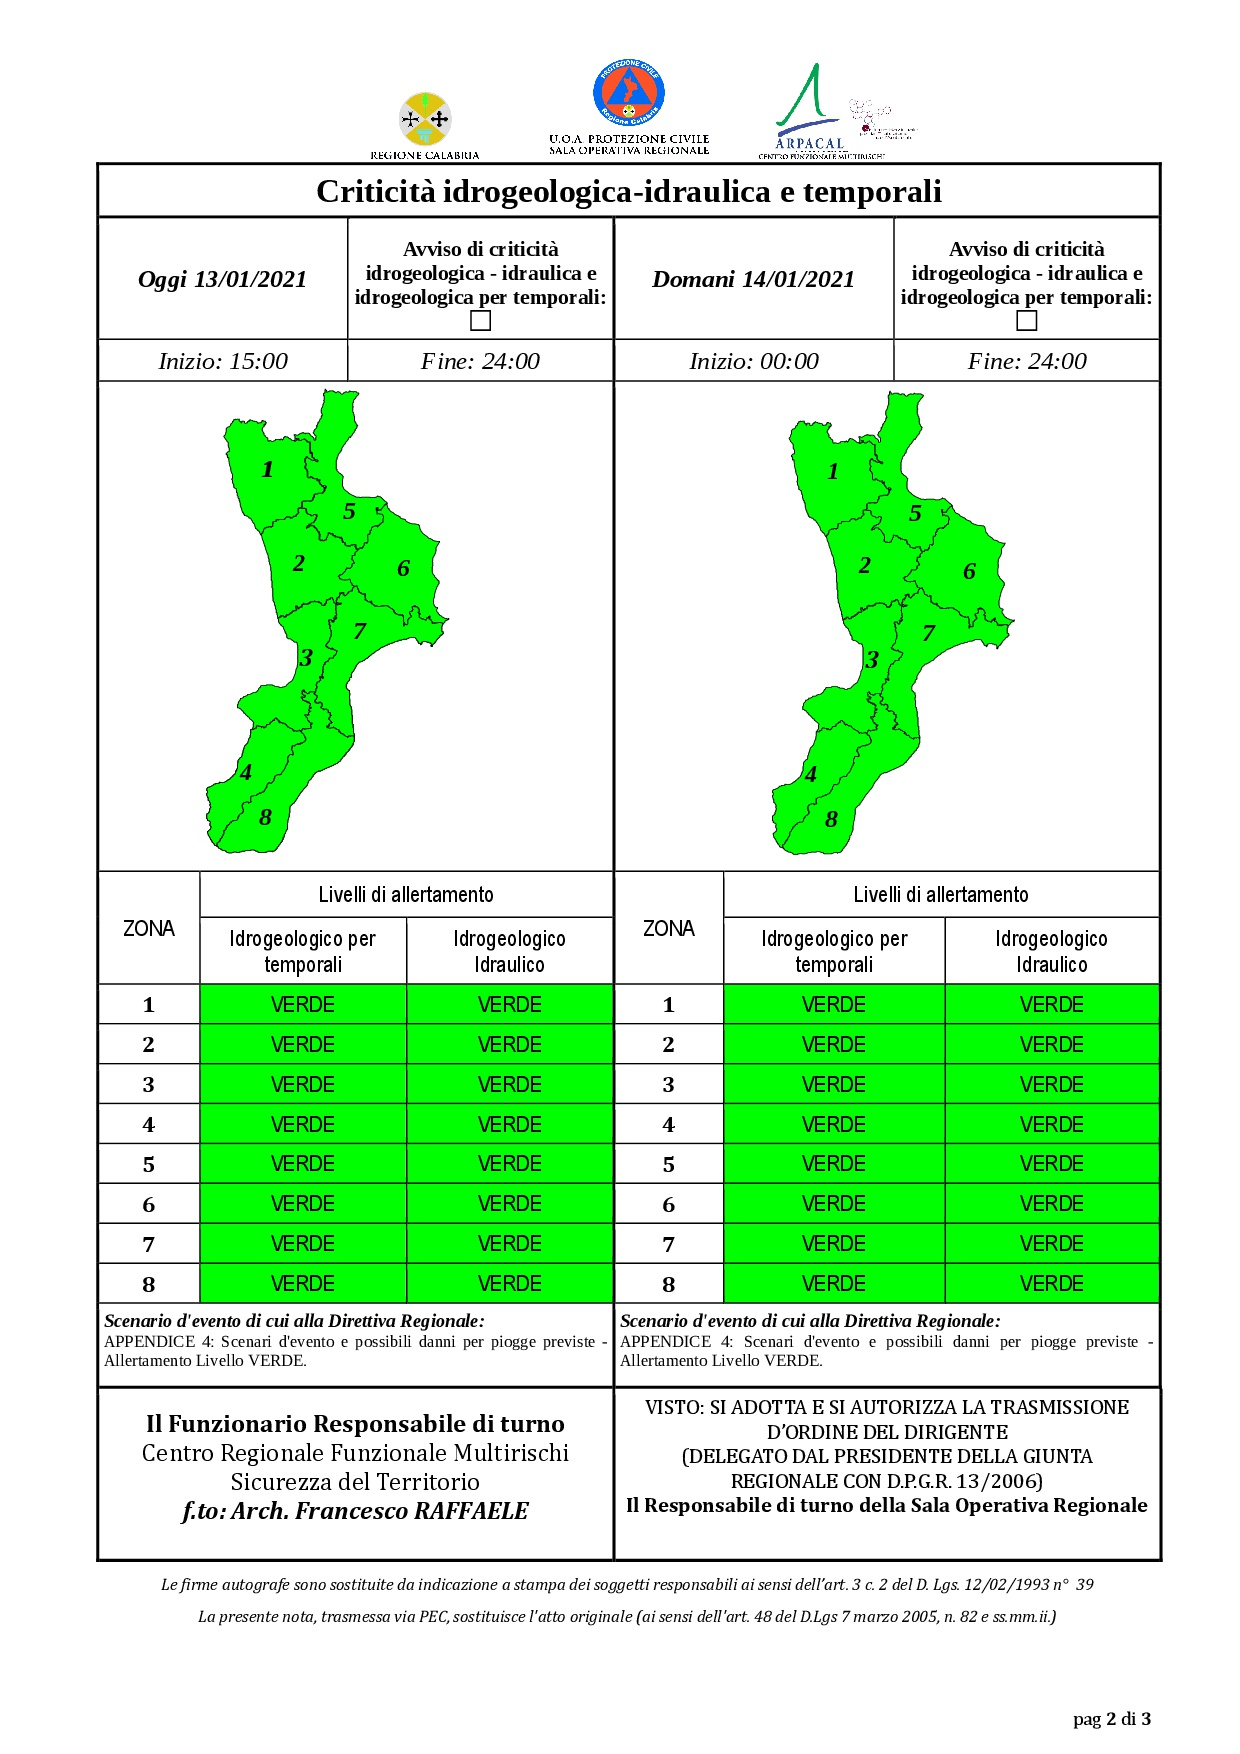 Criticità idrogeologica-idraulica e temporali in Calabria 13-01-2021